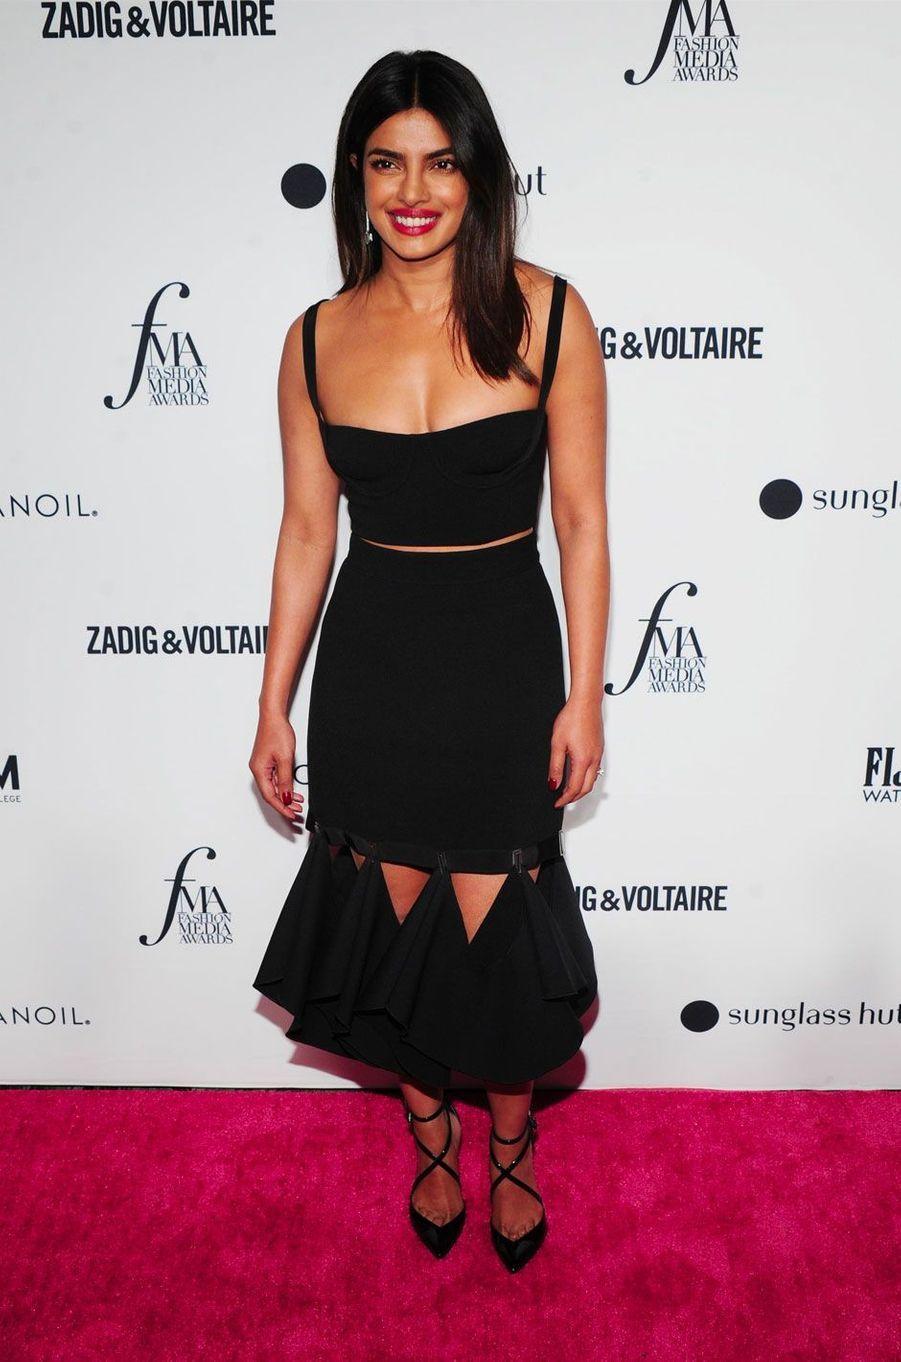 Priyanka Chopra à la soirée des Daily Front Row's Fashion Media Awards à New York, le 6 septembre 2018